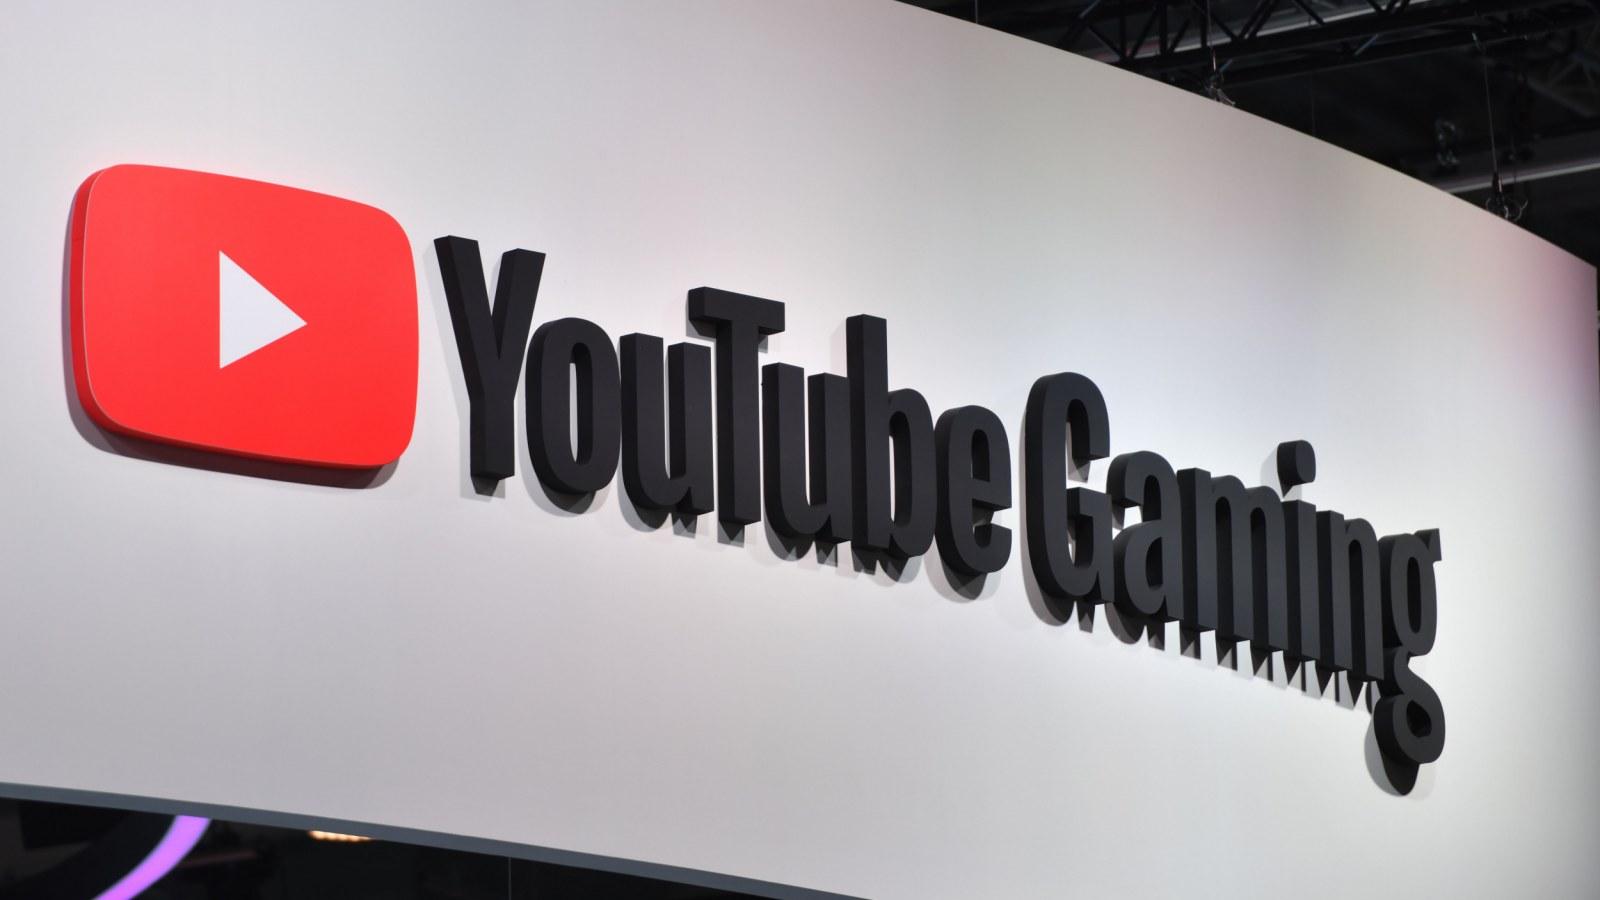 First steps as a Youtube gamer: Branding